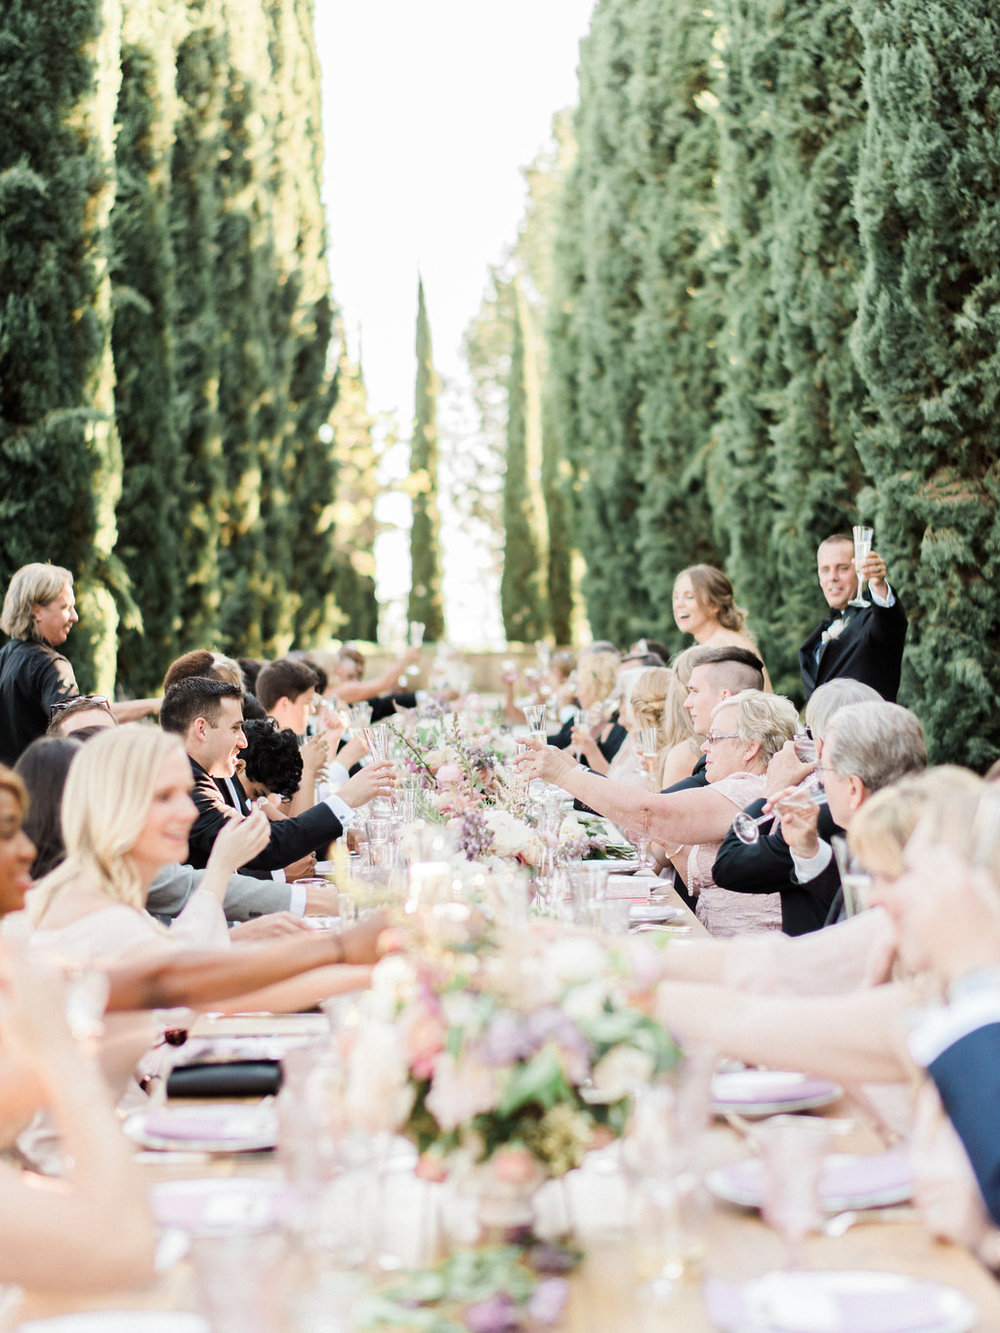 linajaandmichael-wedding-958.jpg